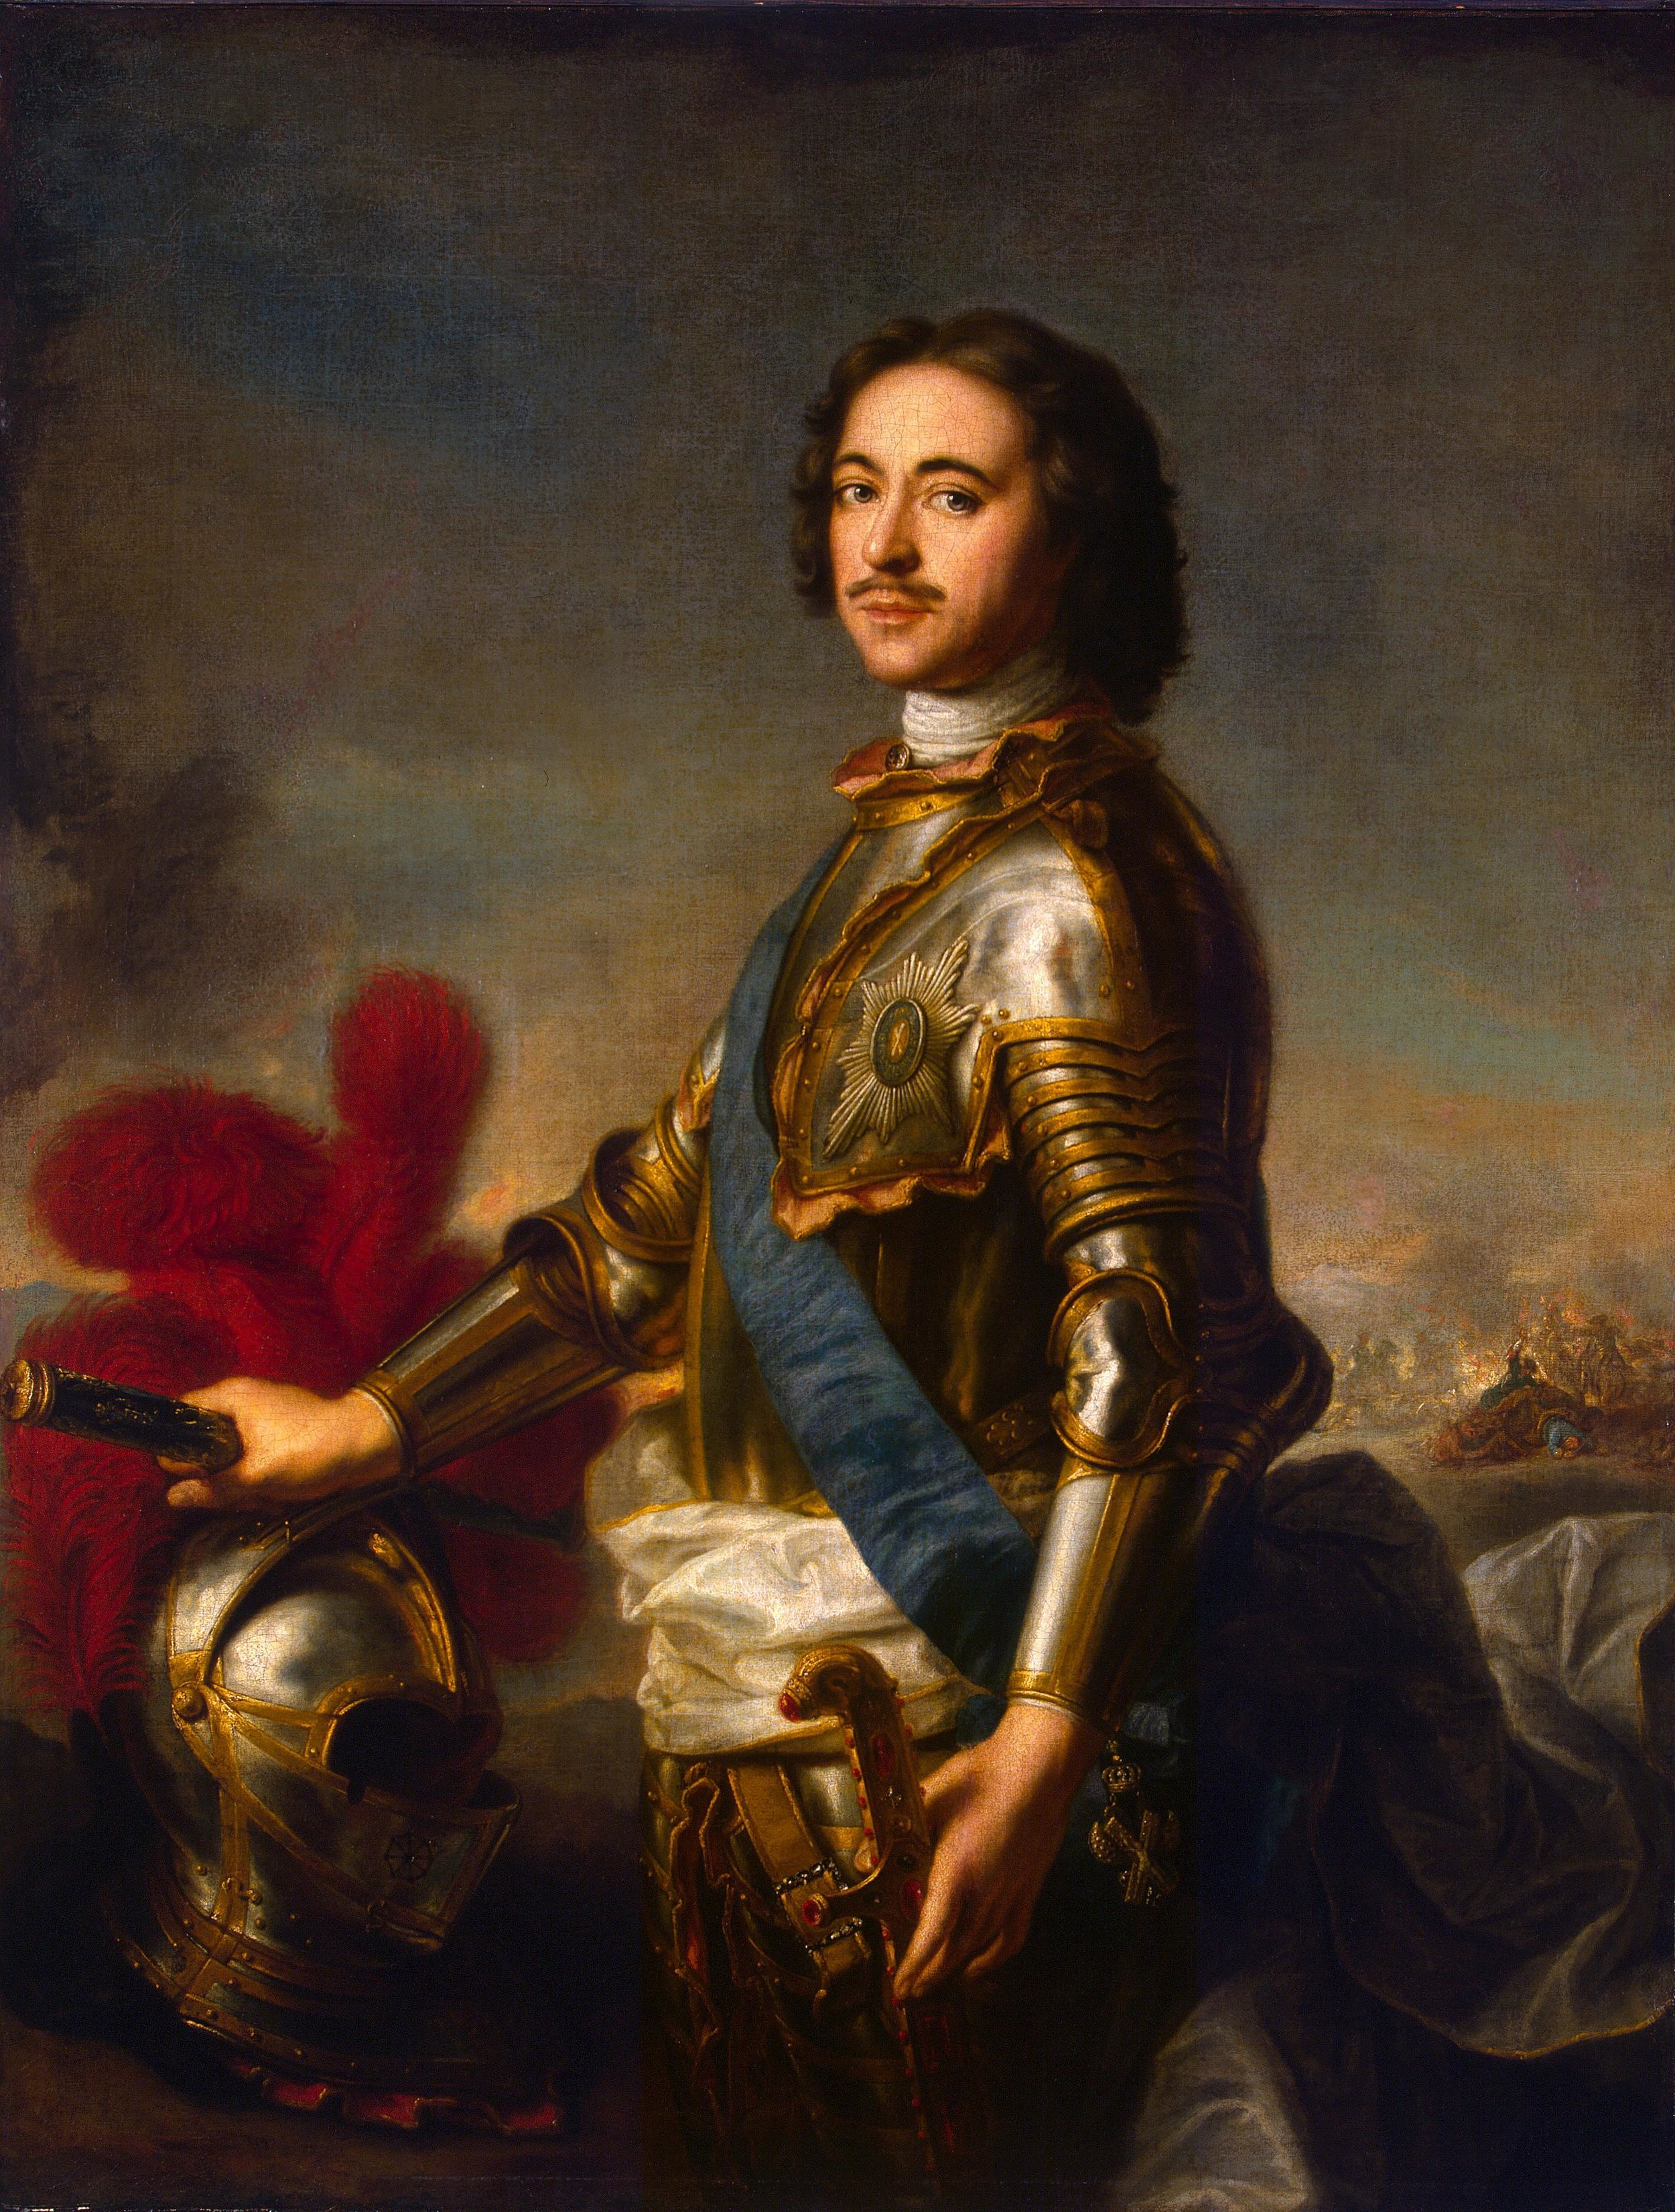 Rysslands tsar Peter I, Jean-Marc Nattier, 1717. Eremitaget, S:t Petersburg.